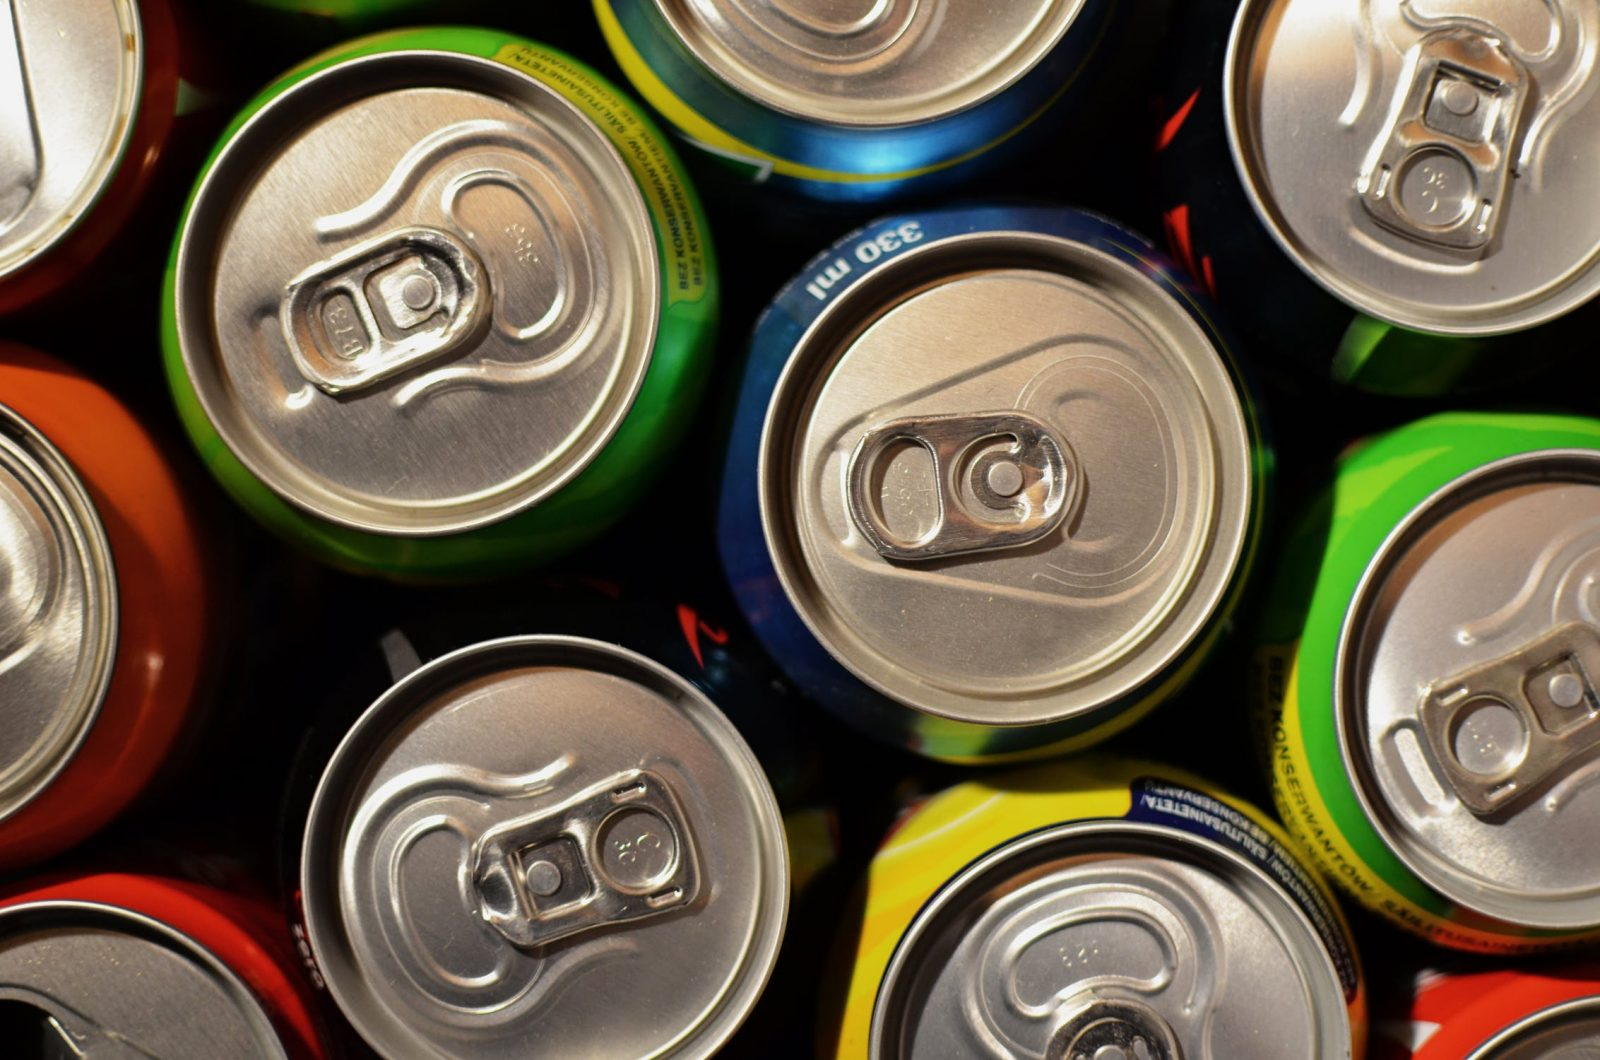 Wann nach Weisheitszahn OP Energy Drinks?